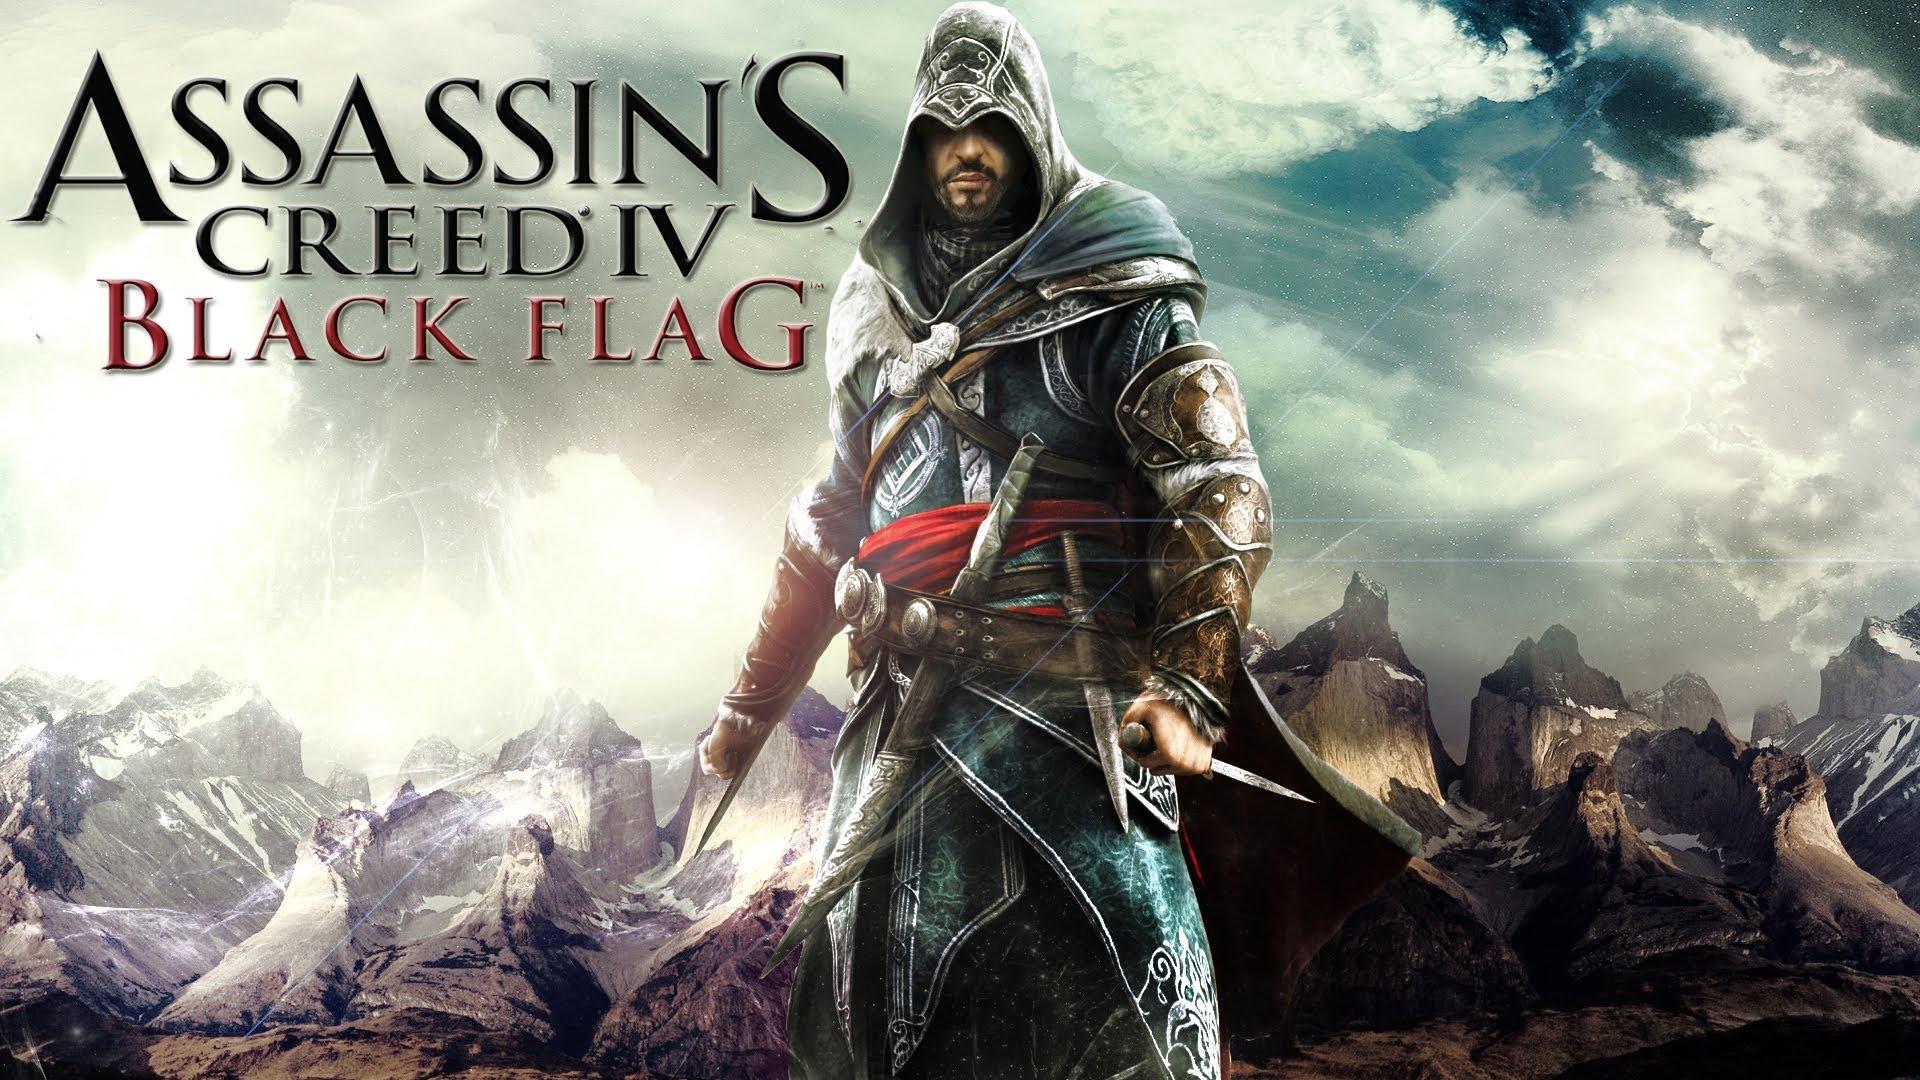 Assassin's Creed IV: Black Flag - Game Retina